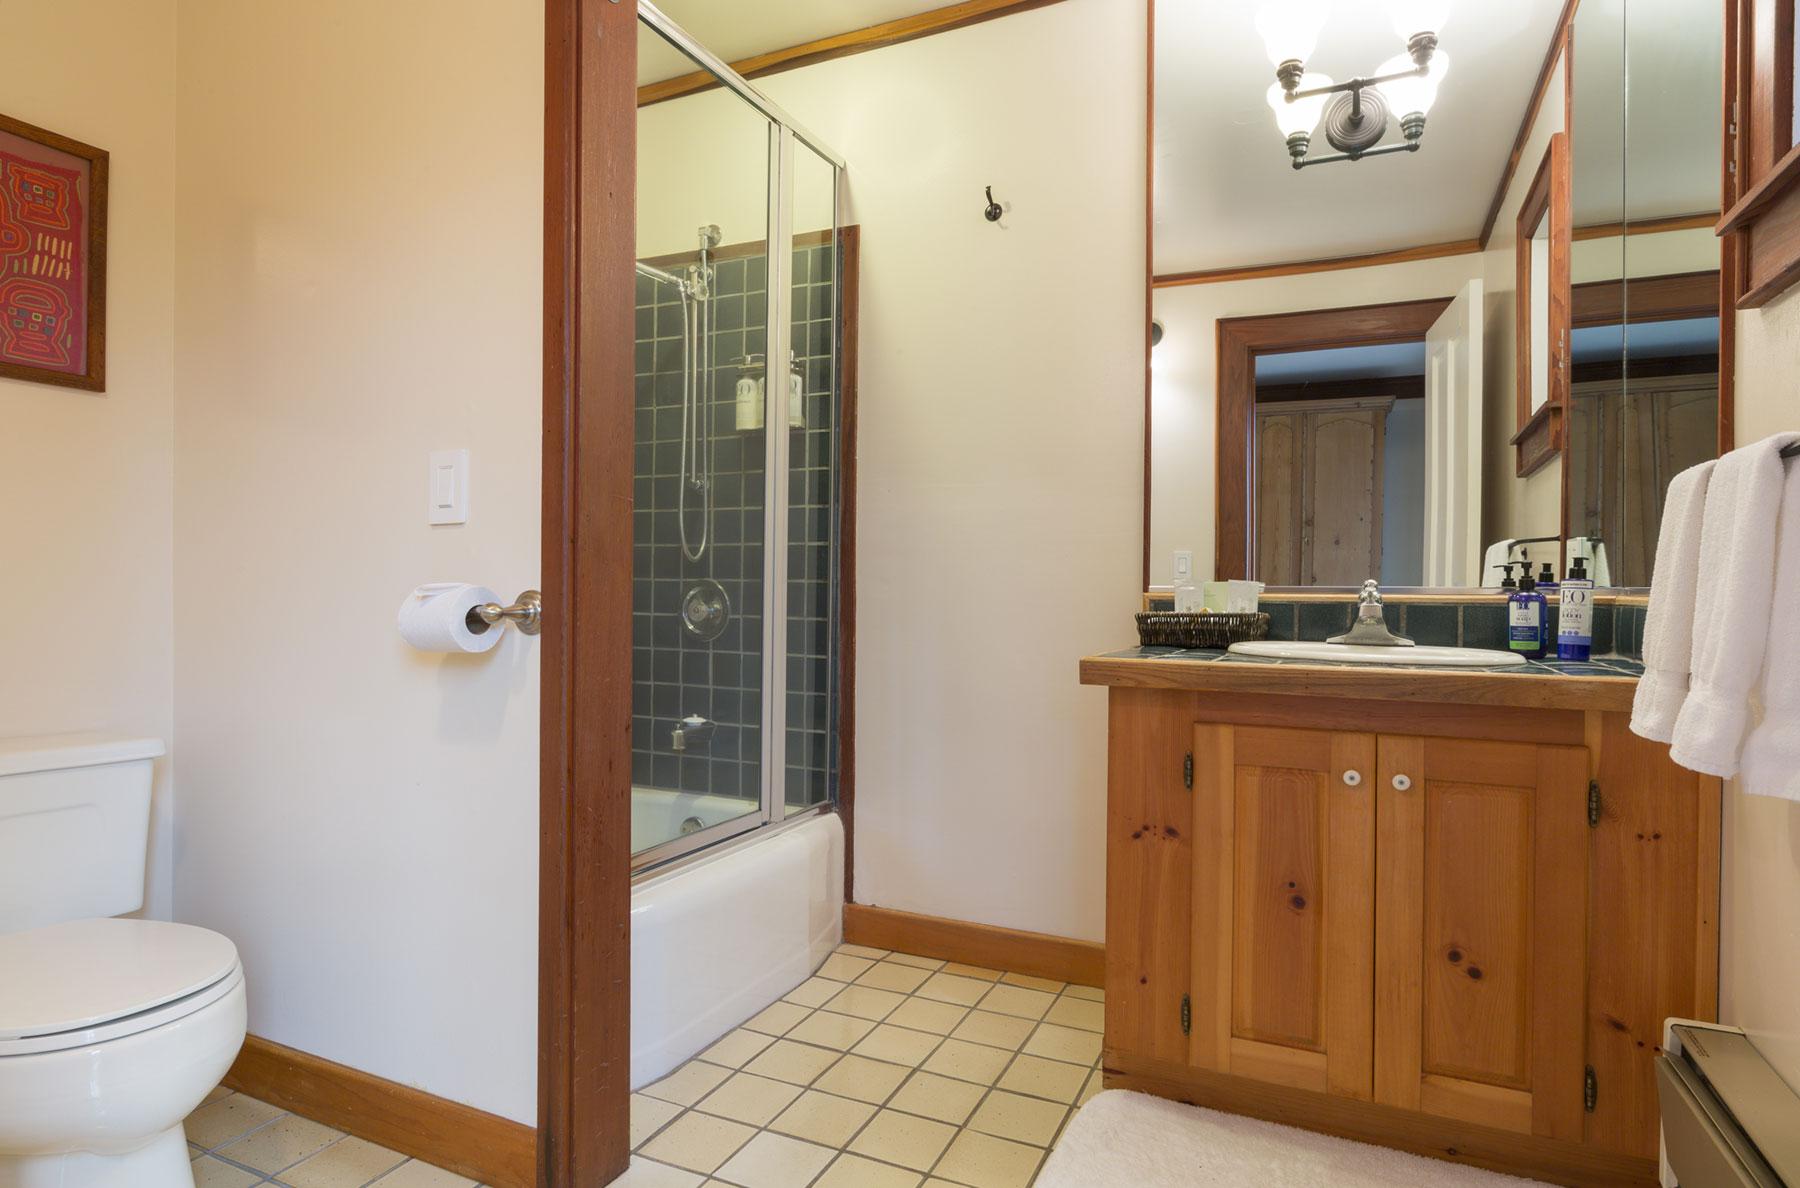 The Pinewood bathroom